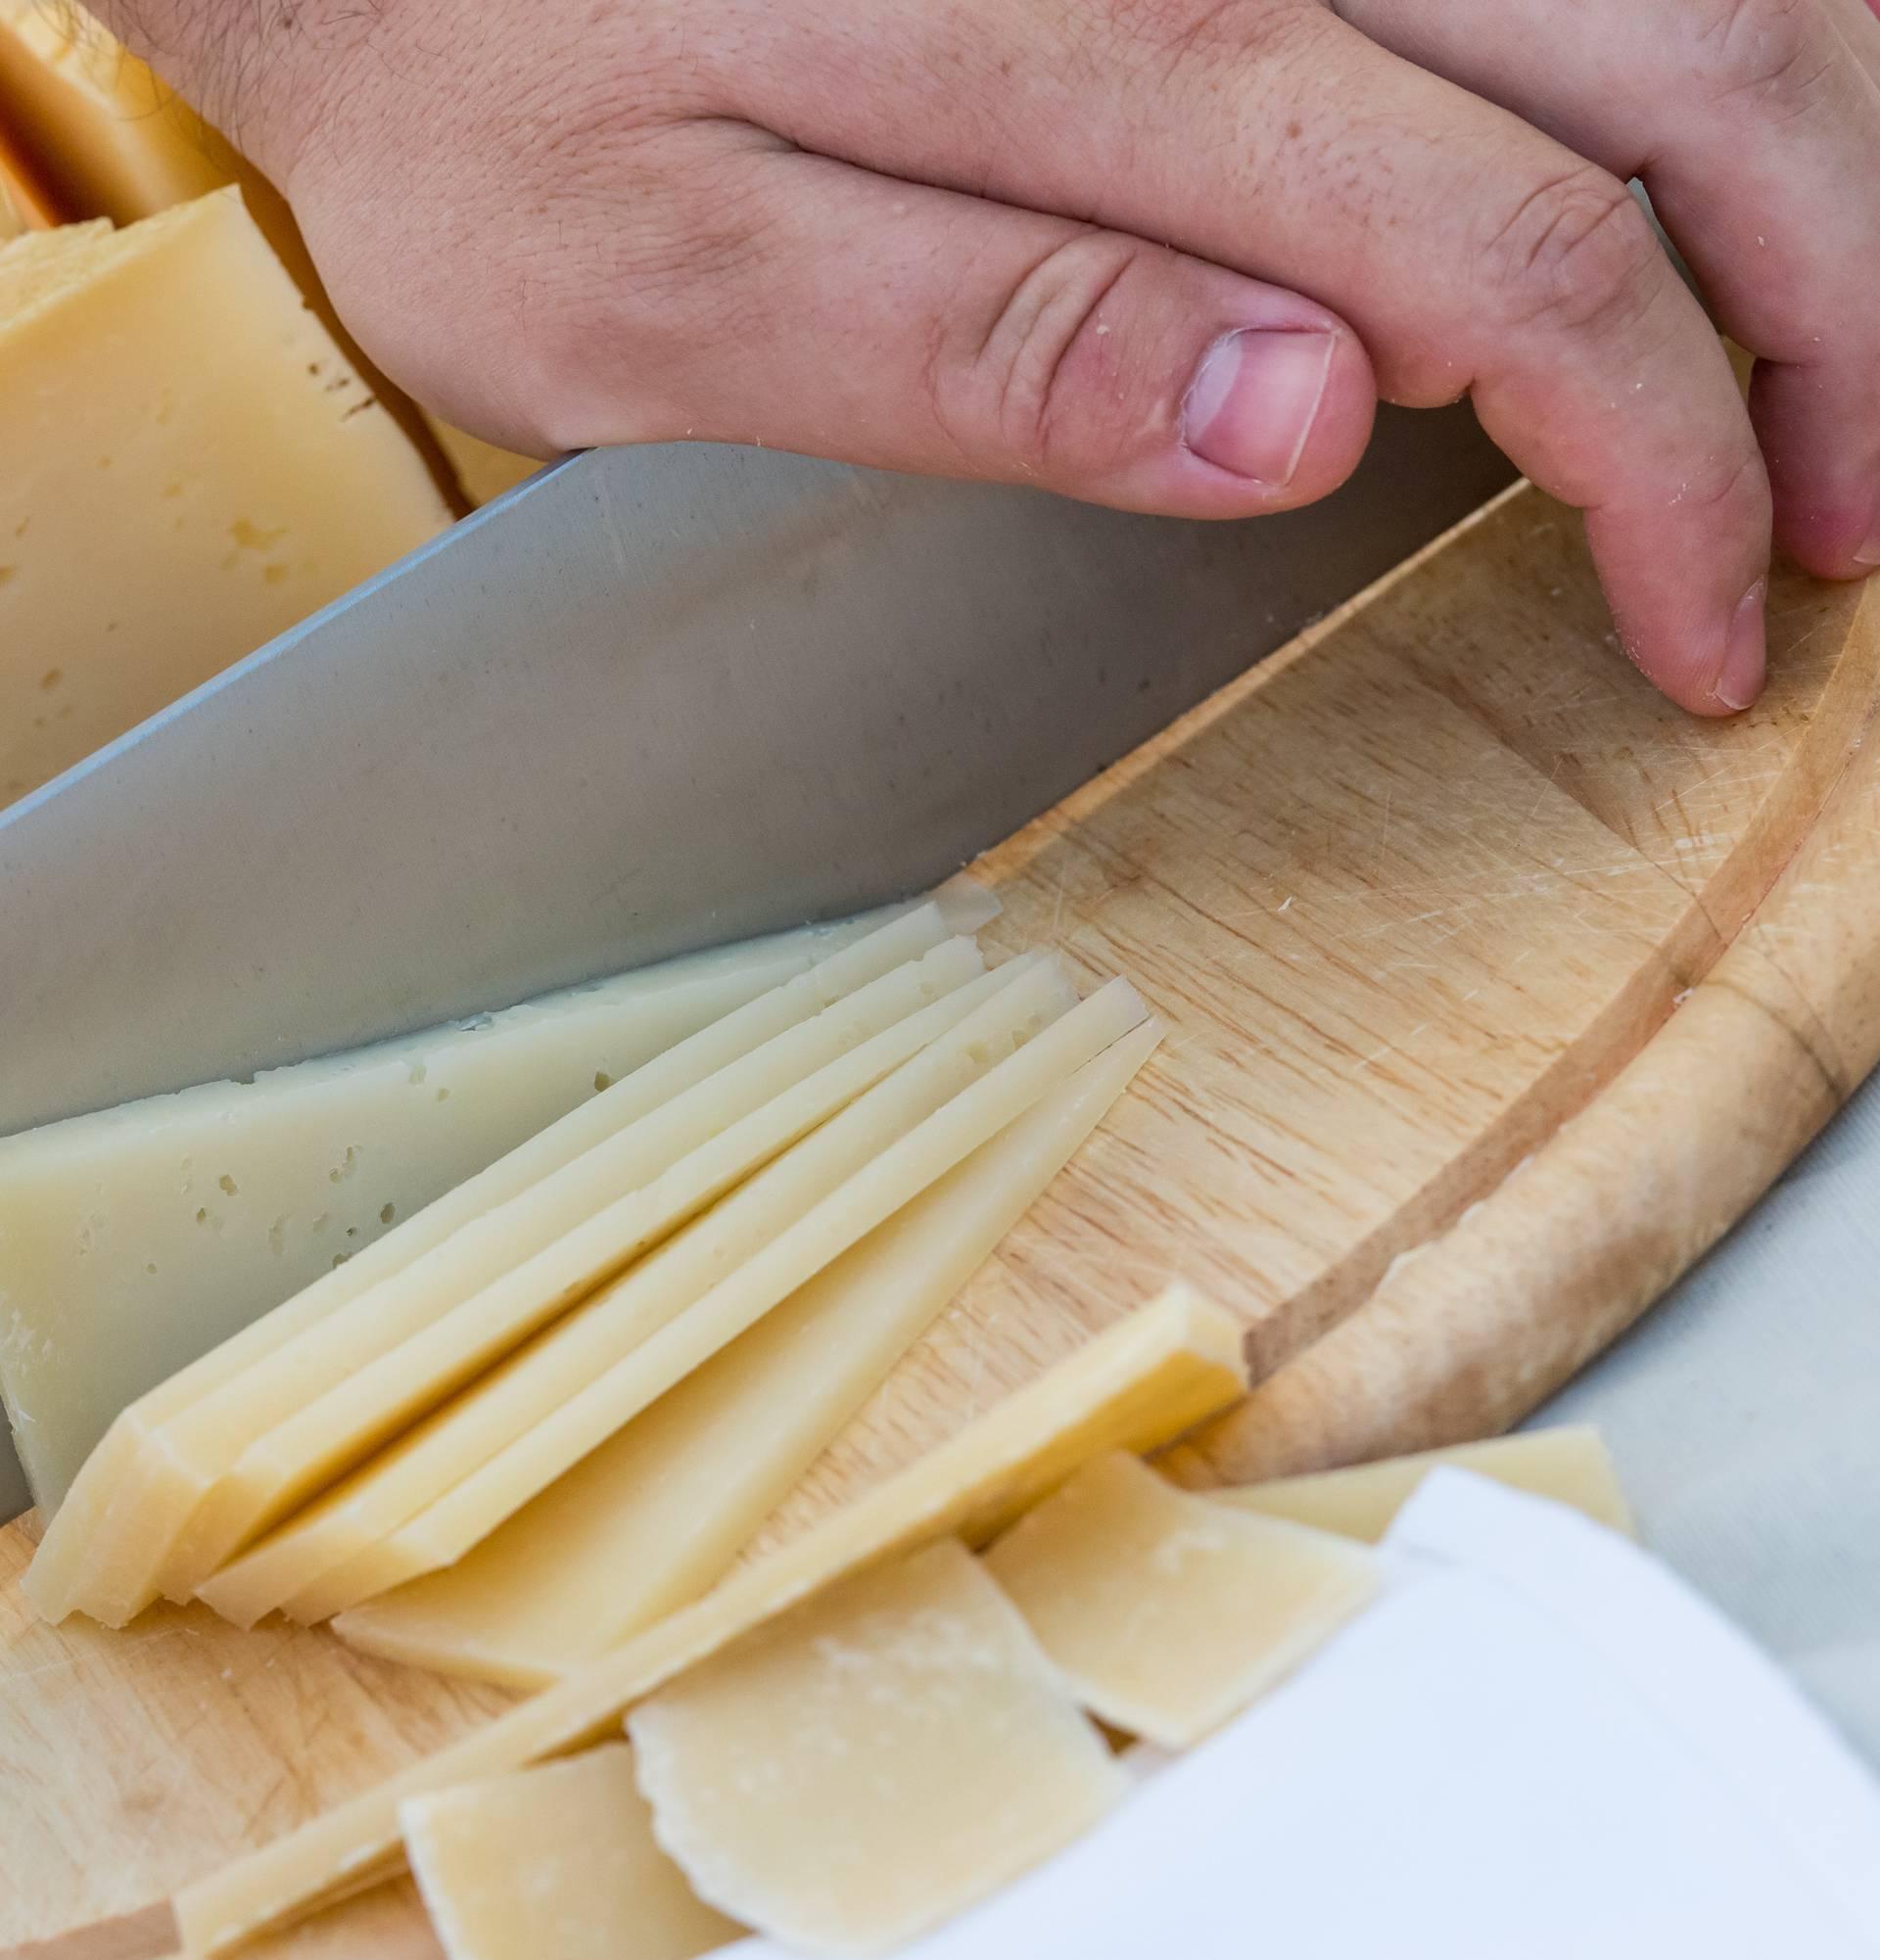 Krekeri i sir mogu biti korisni navečer, osobito ako radite